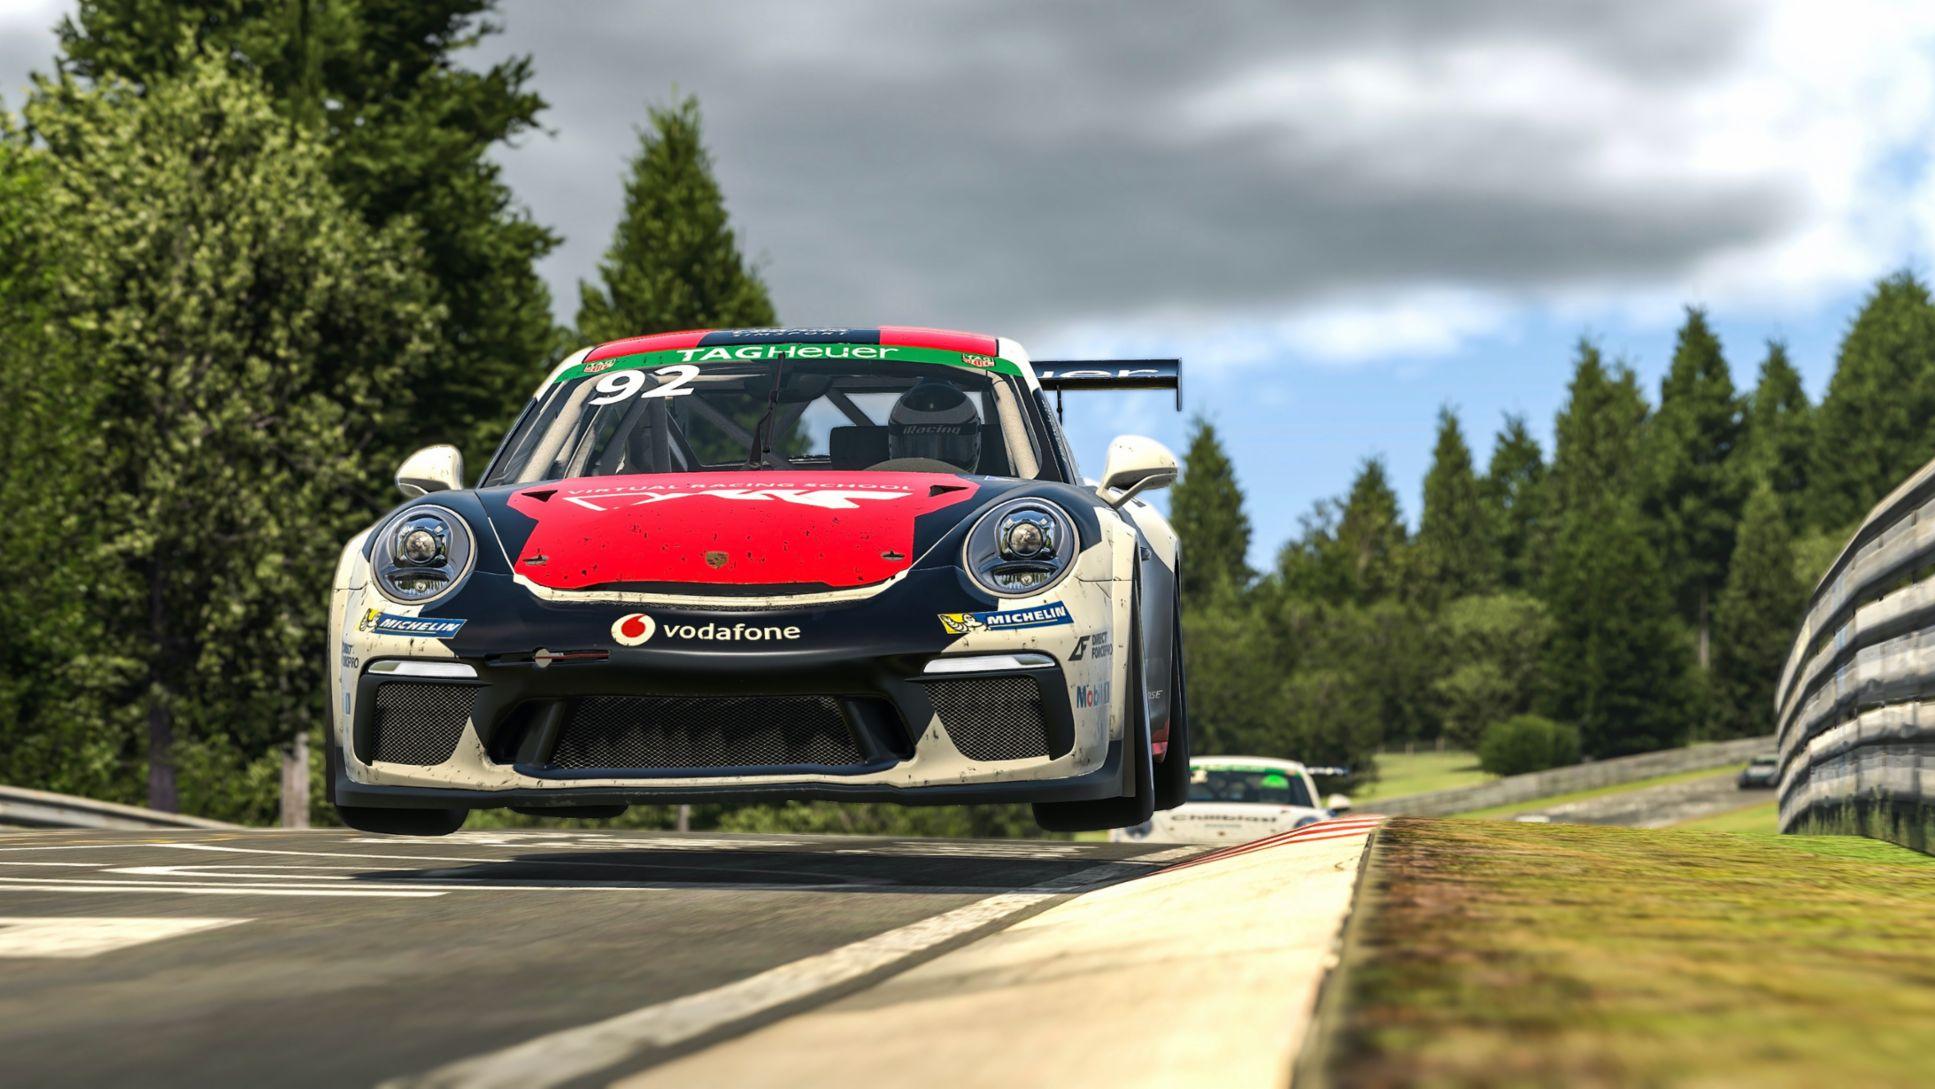 Iracing Porsche Supercup: Job loses points against Rogers